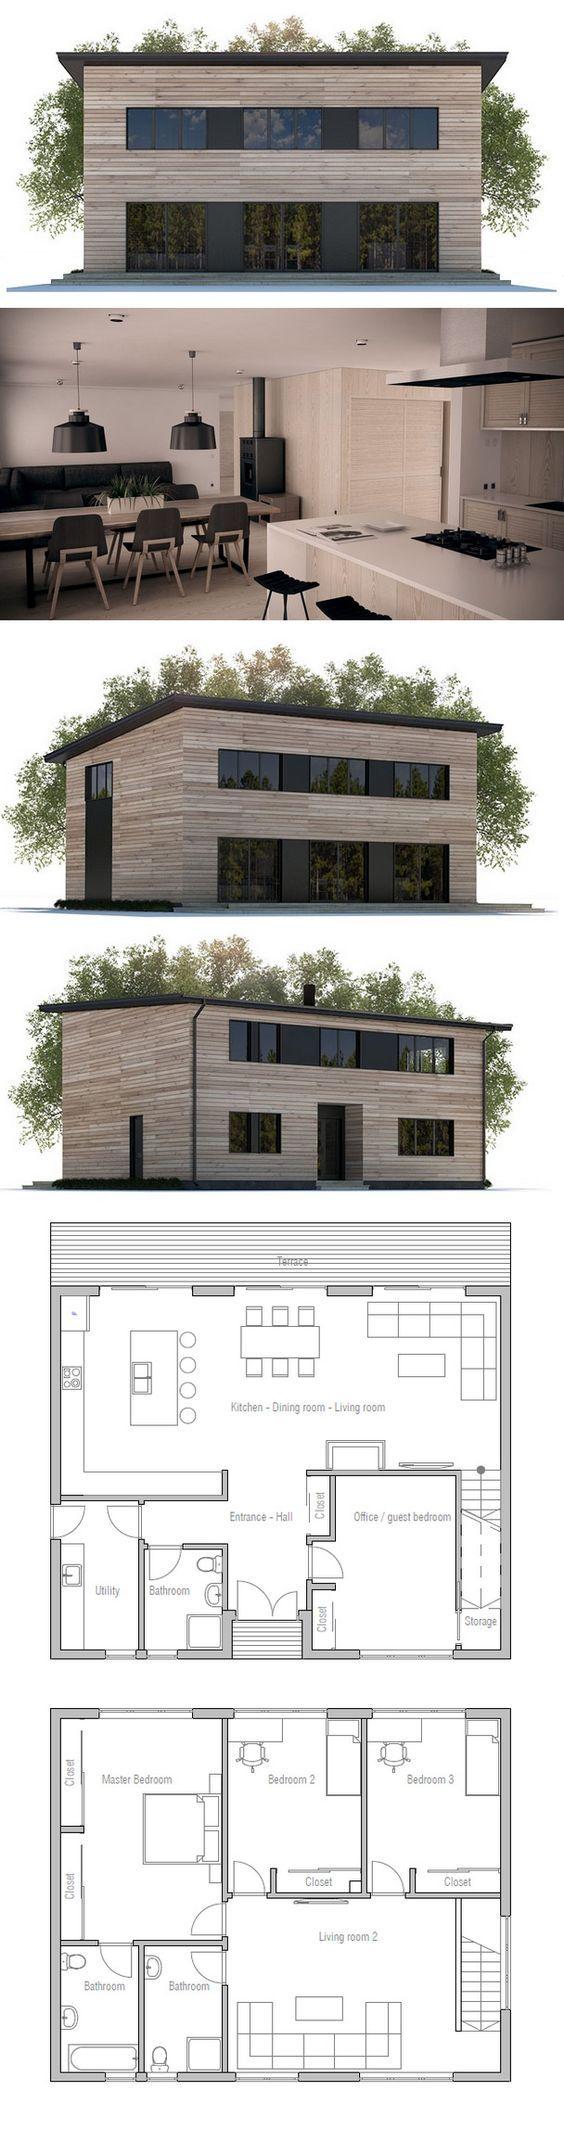 1000 ideas sobre planos de casas economicas en pinterest for Planos de viviendas economicas